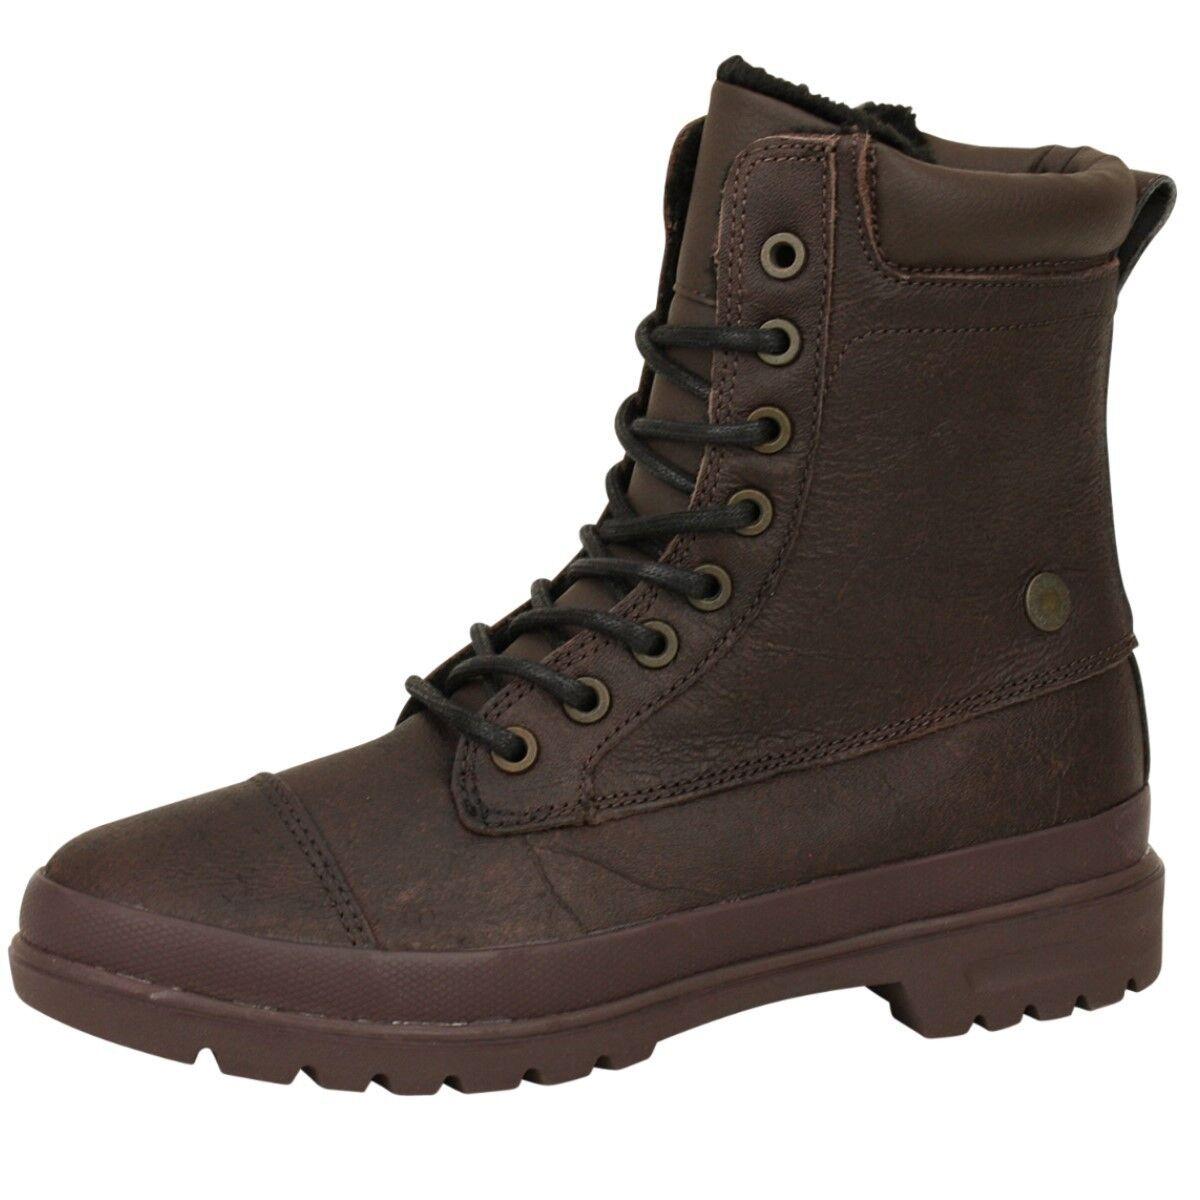 DC Schuhes Damen Stiefel Amnesti Winter Schuhe mit mit Schuhe Fell braun Frauen Stiefel Damens e06d3a